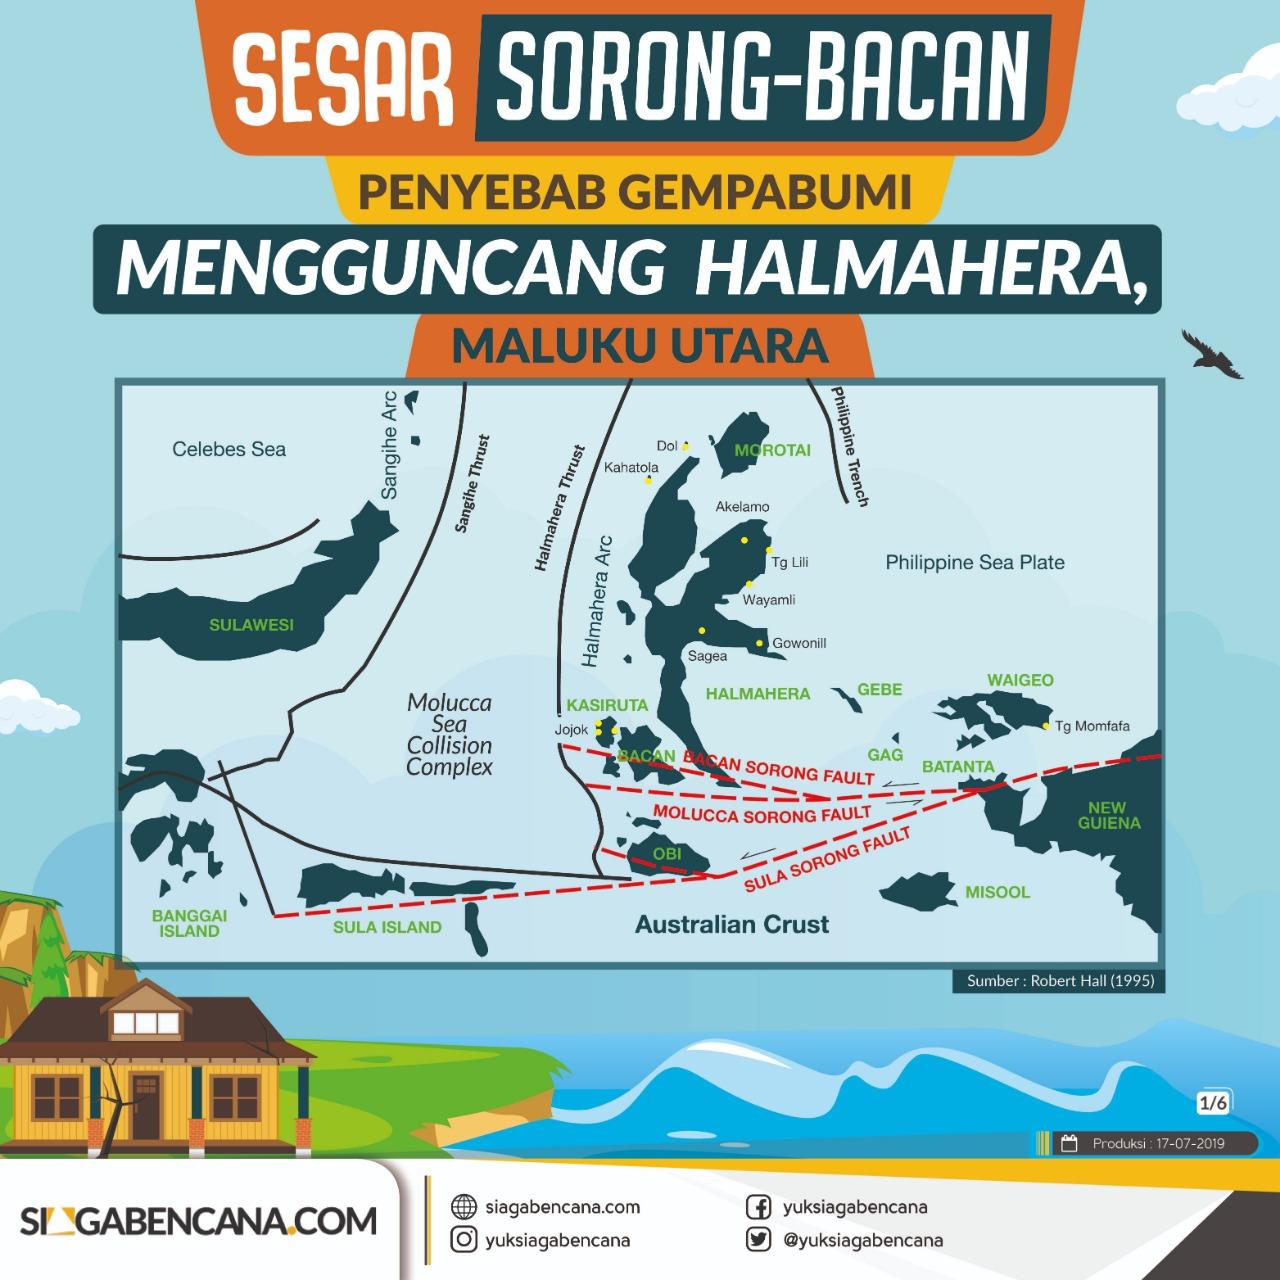 Sesar Sorong-Bacan